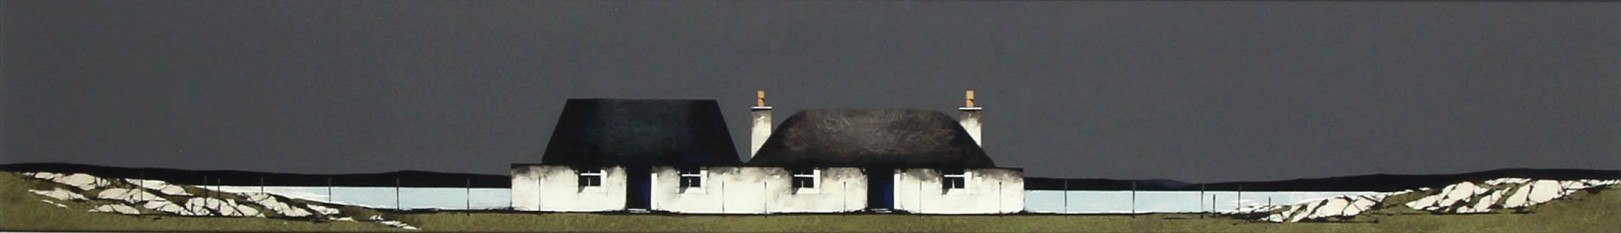 Ron Lawson _Original_Watercolour and Gouache_Tiree Cottage, balevullin_image 6x38.5